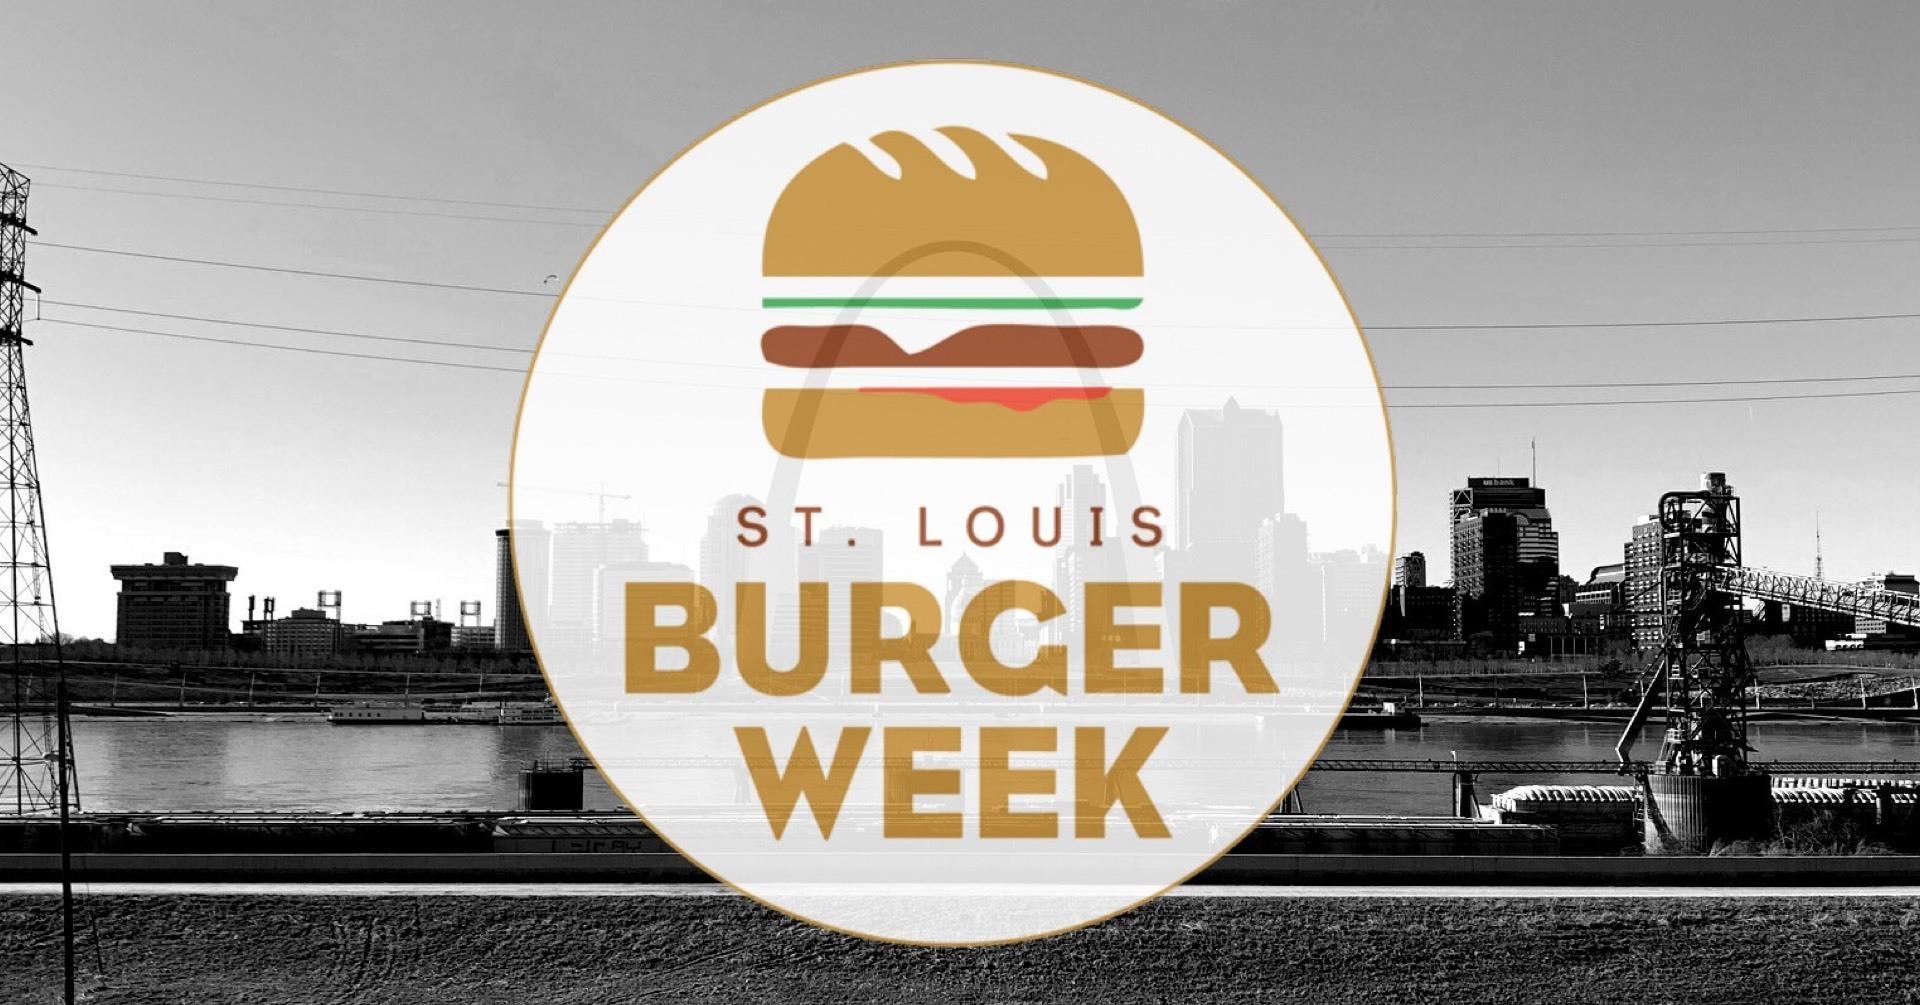 St. Louis Burger Week